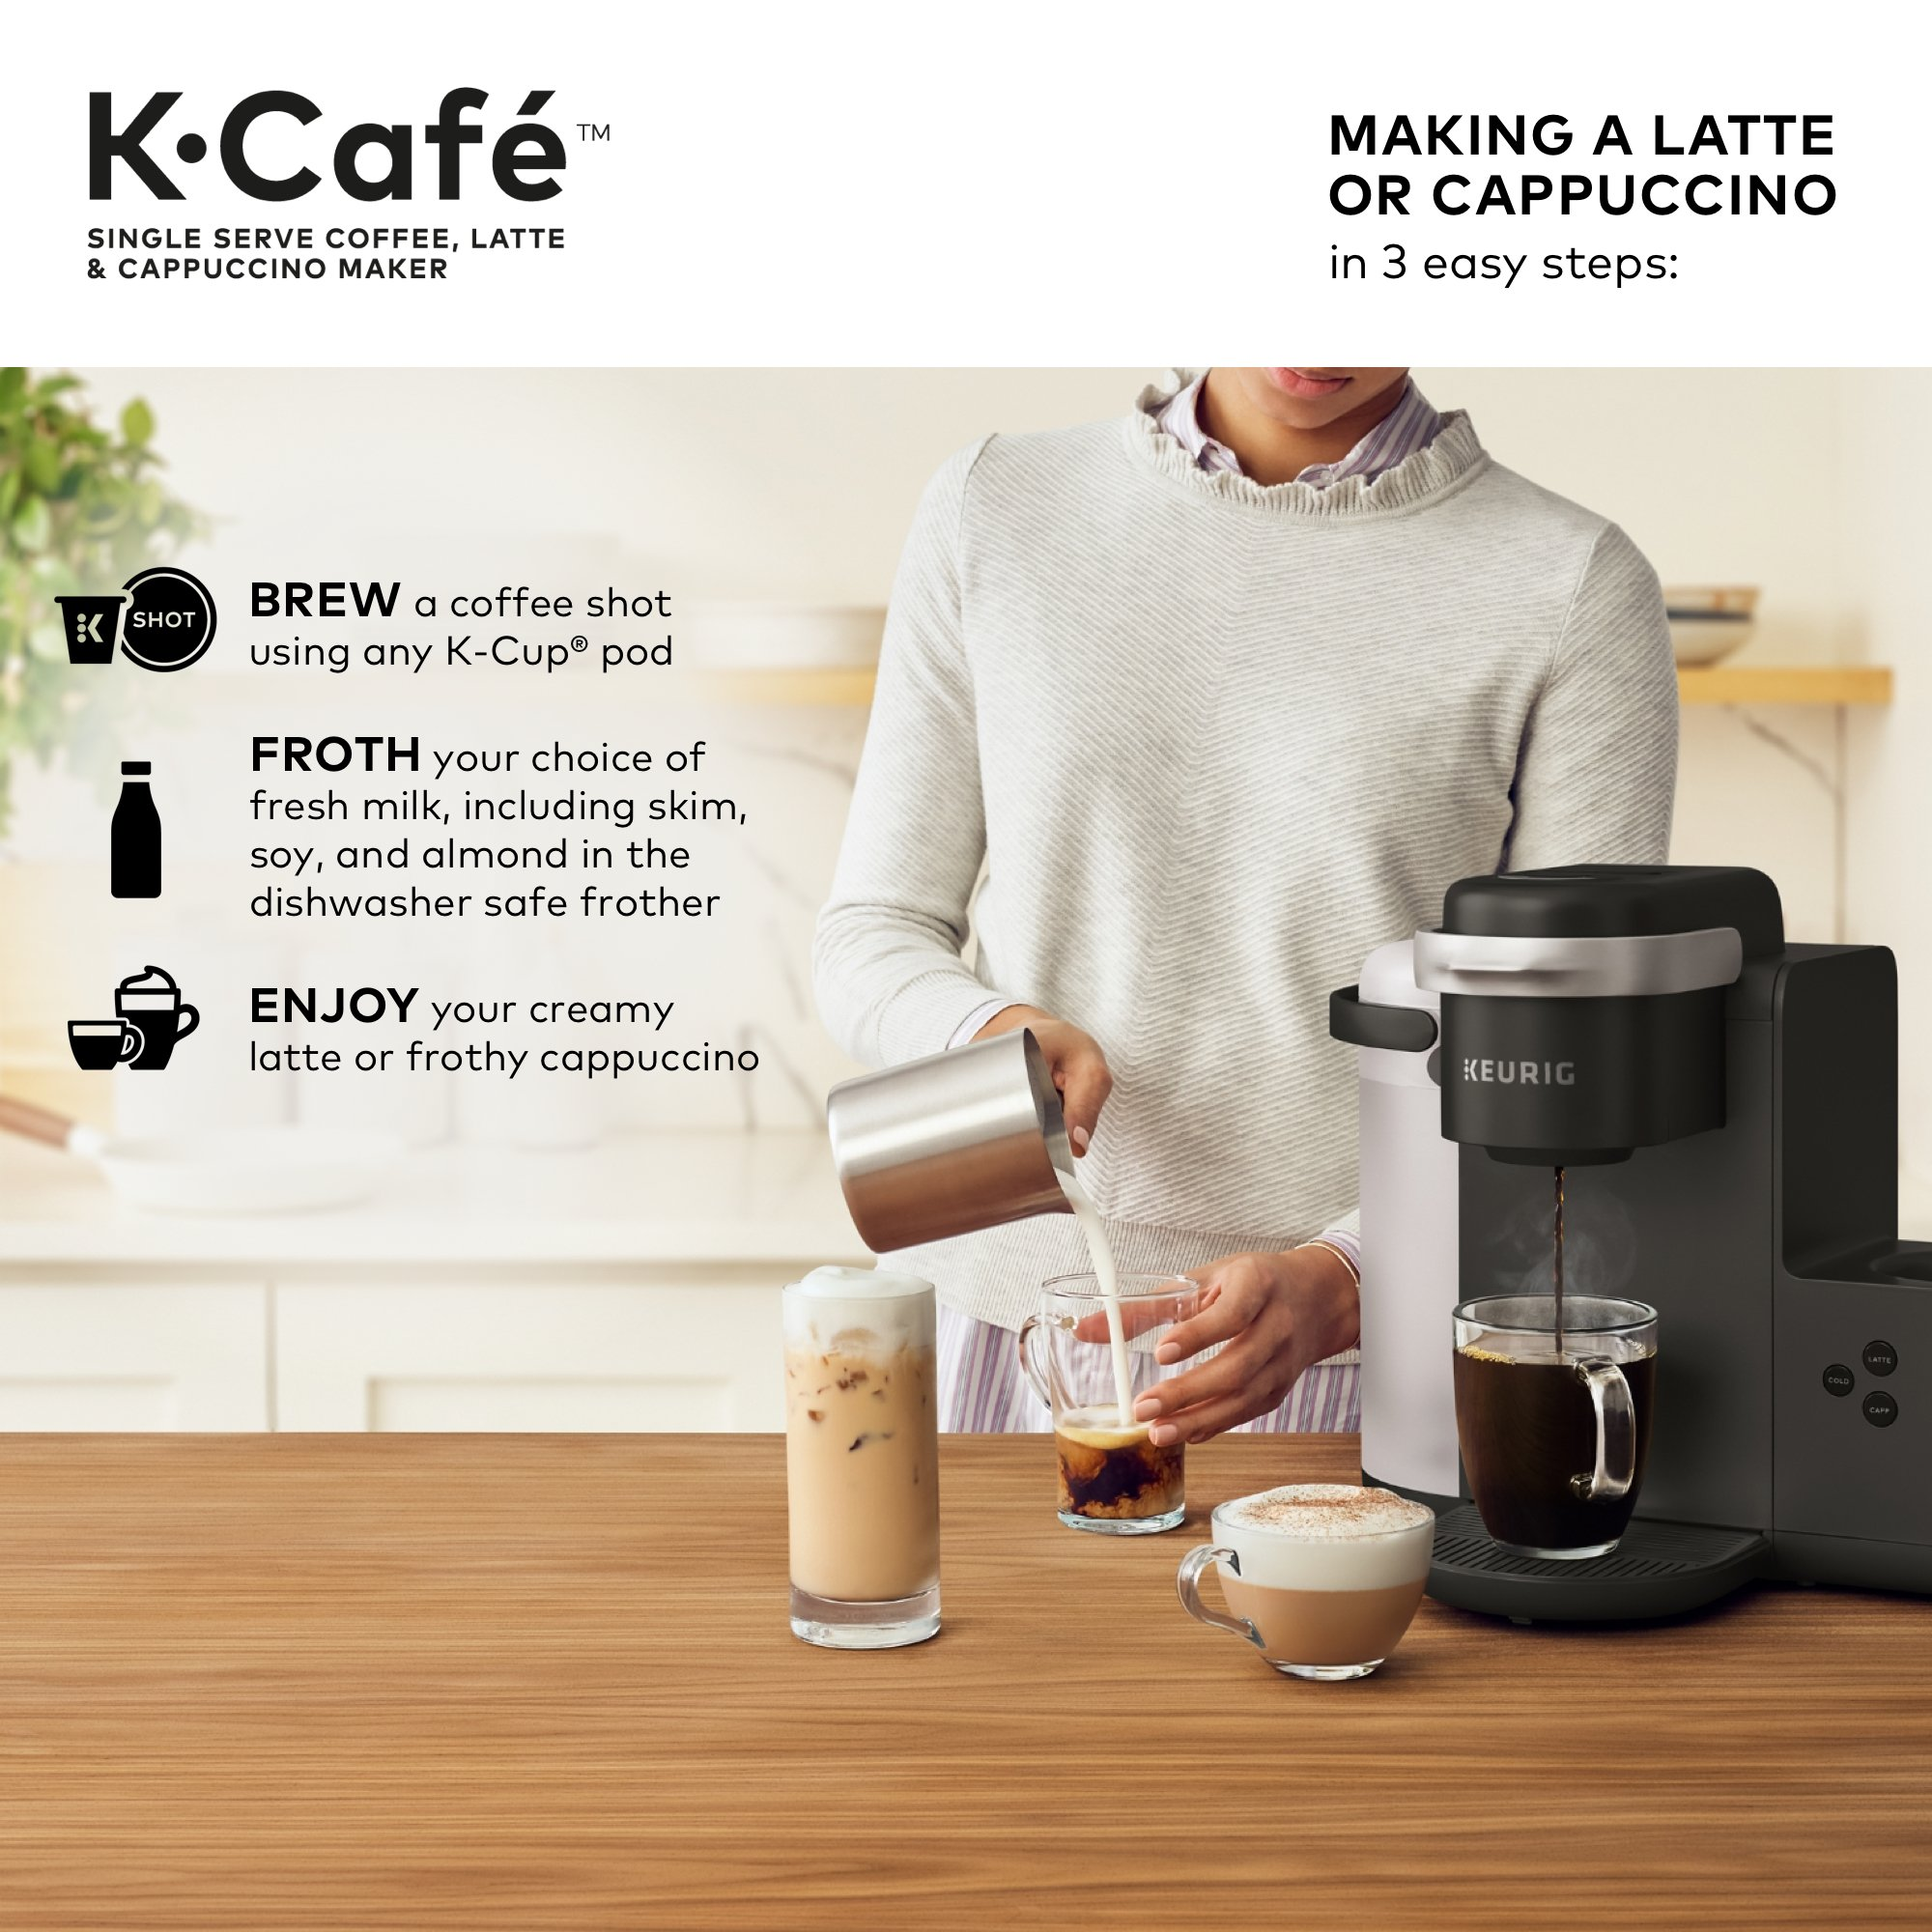 Galleon Keurig K Cafe Single Serve K Cup Coffee Maker